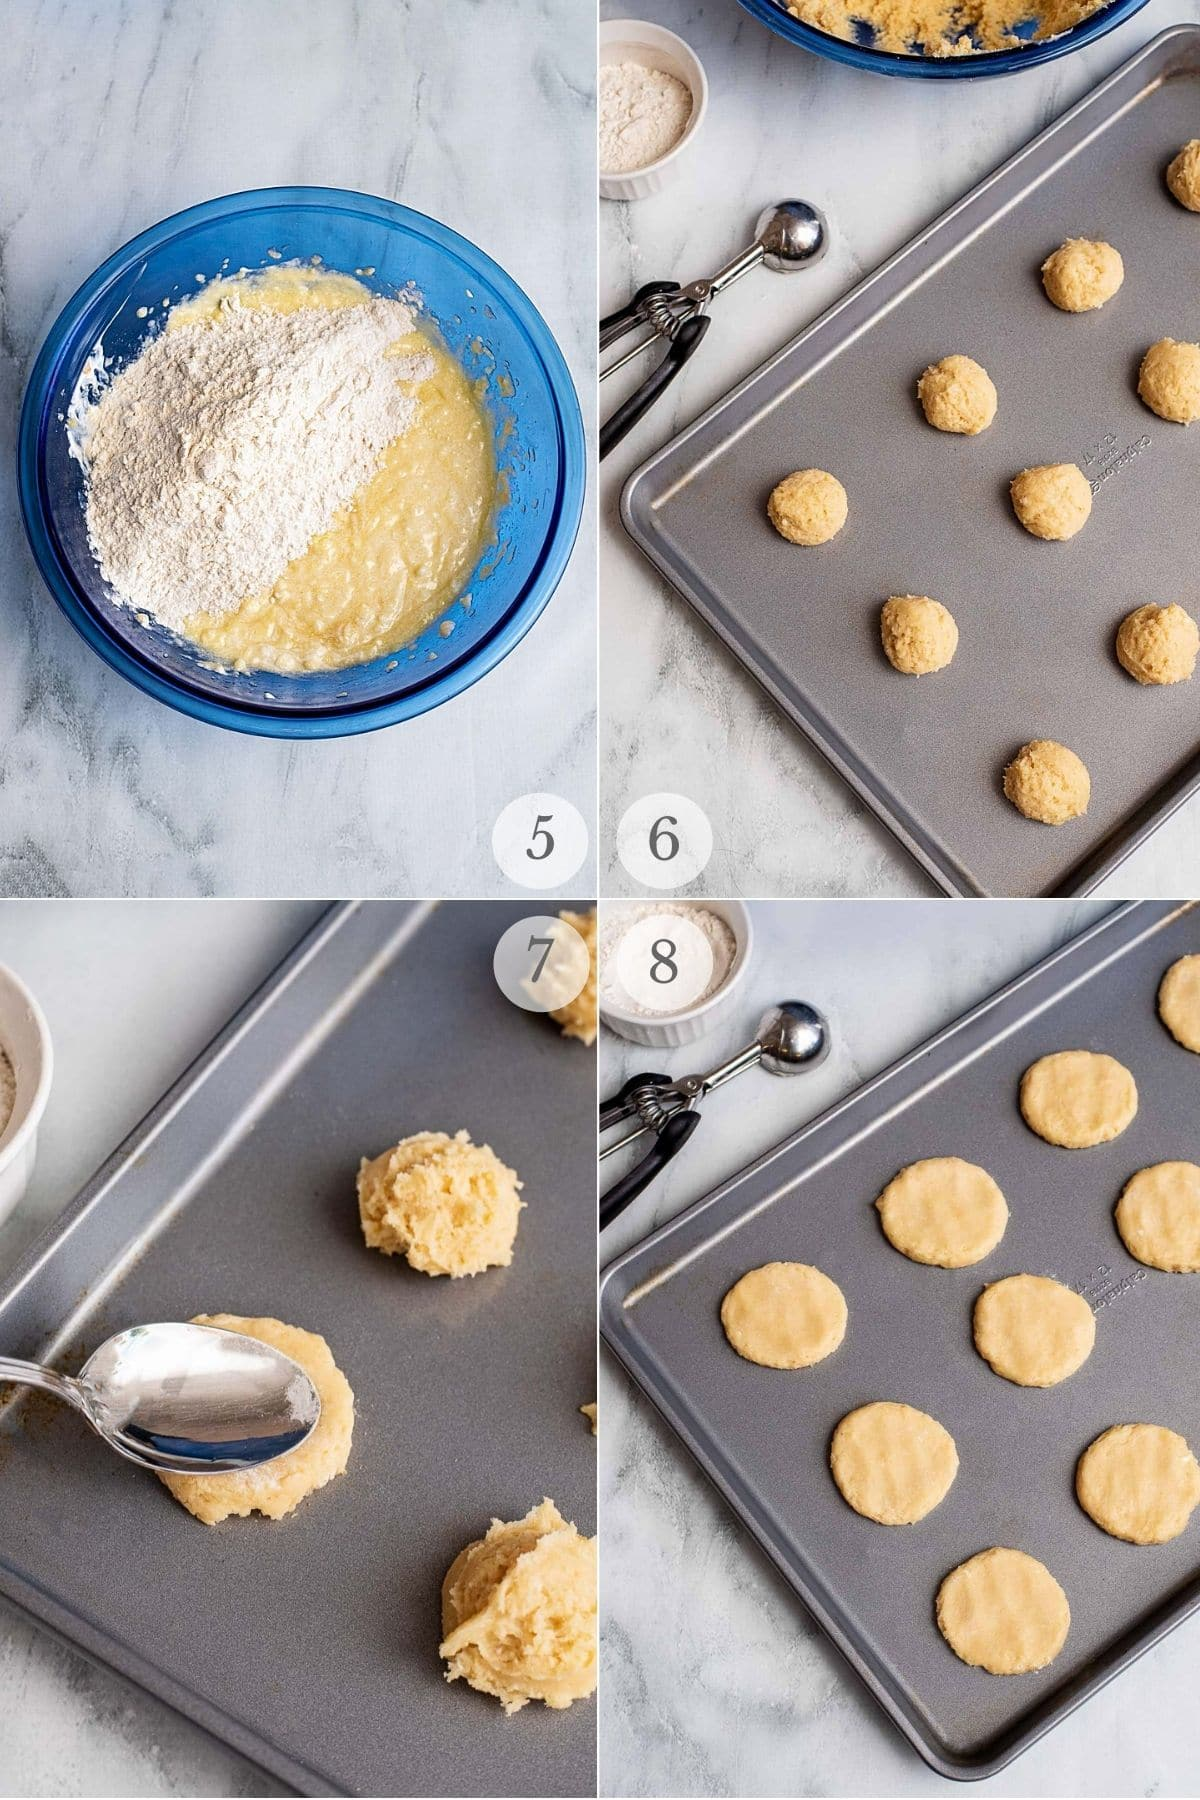 lofthouse cookies recipe steps 5-8